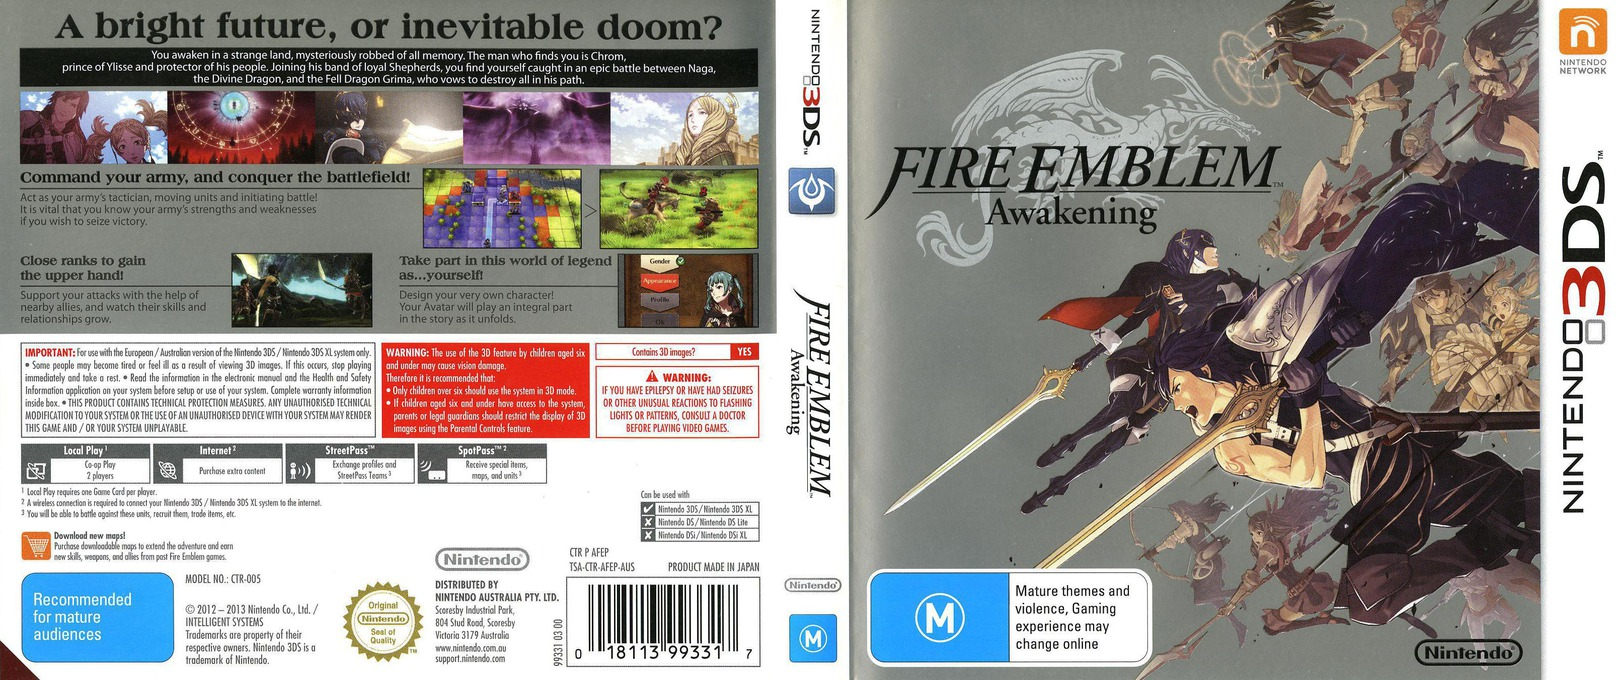 Fire Emblem - Awakening 3DS coverfullHQ (AFEP)